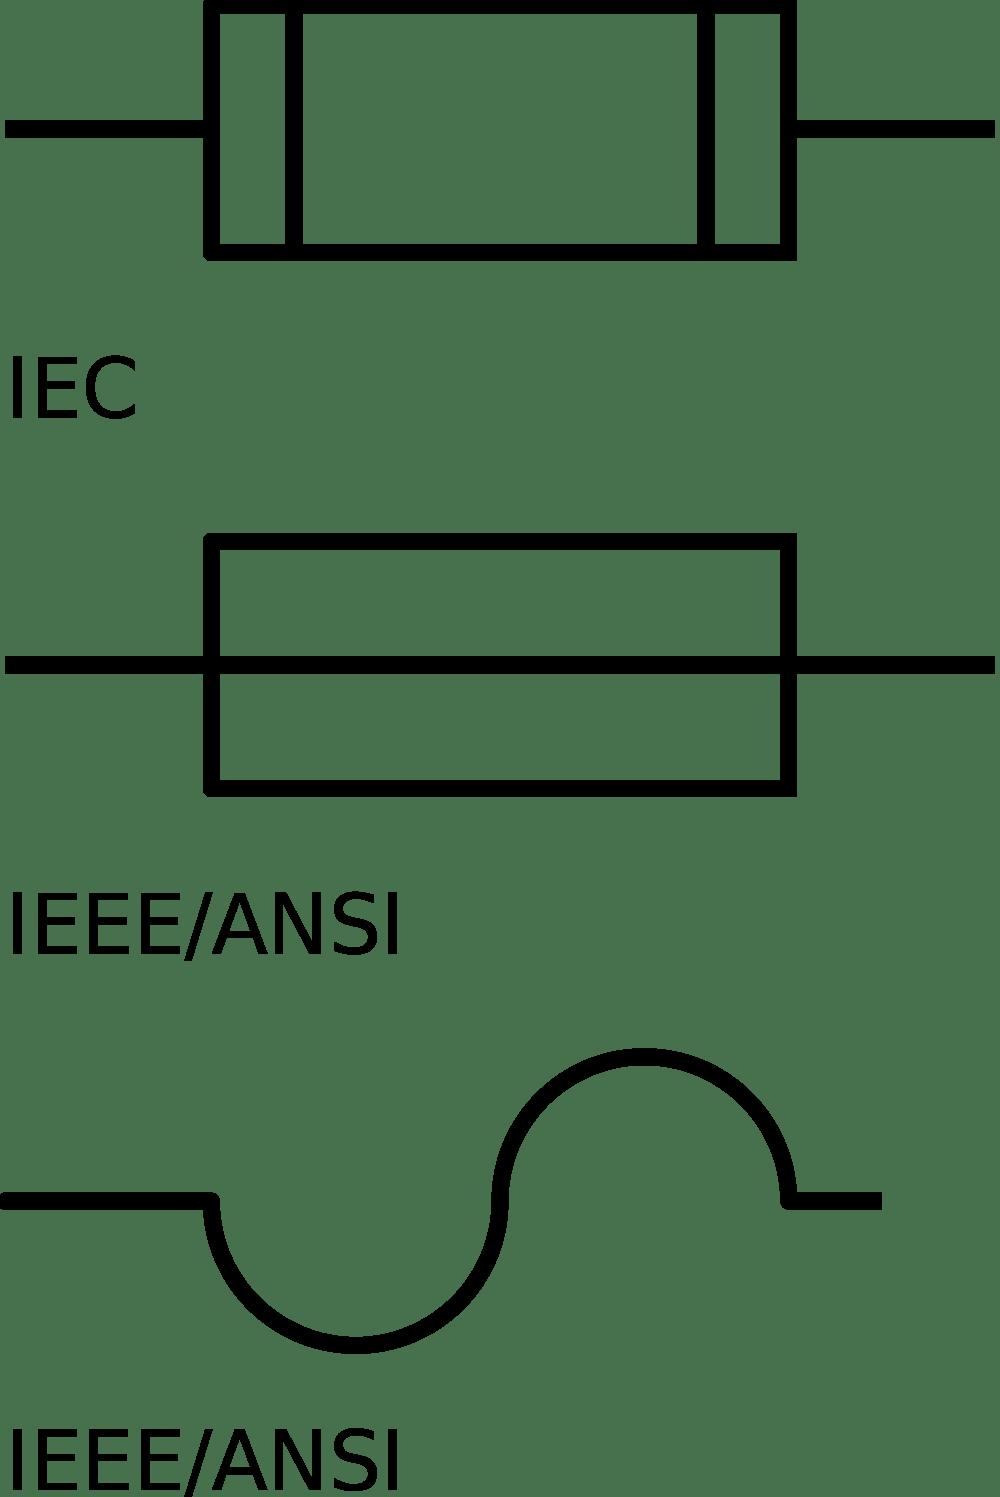 medium resolution of wiring diagram symbols fuse electric clipart open circuit